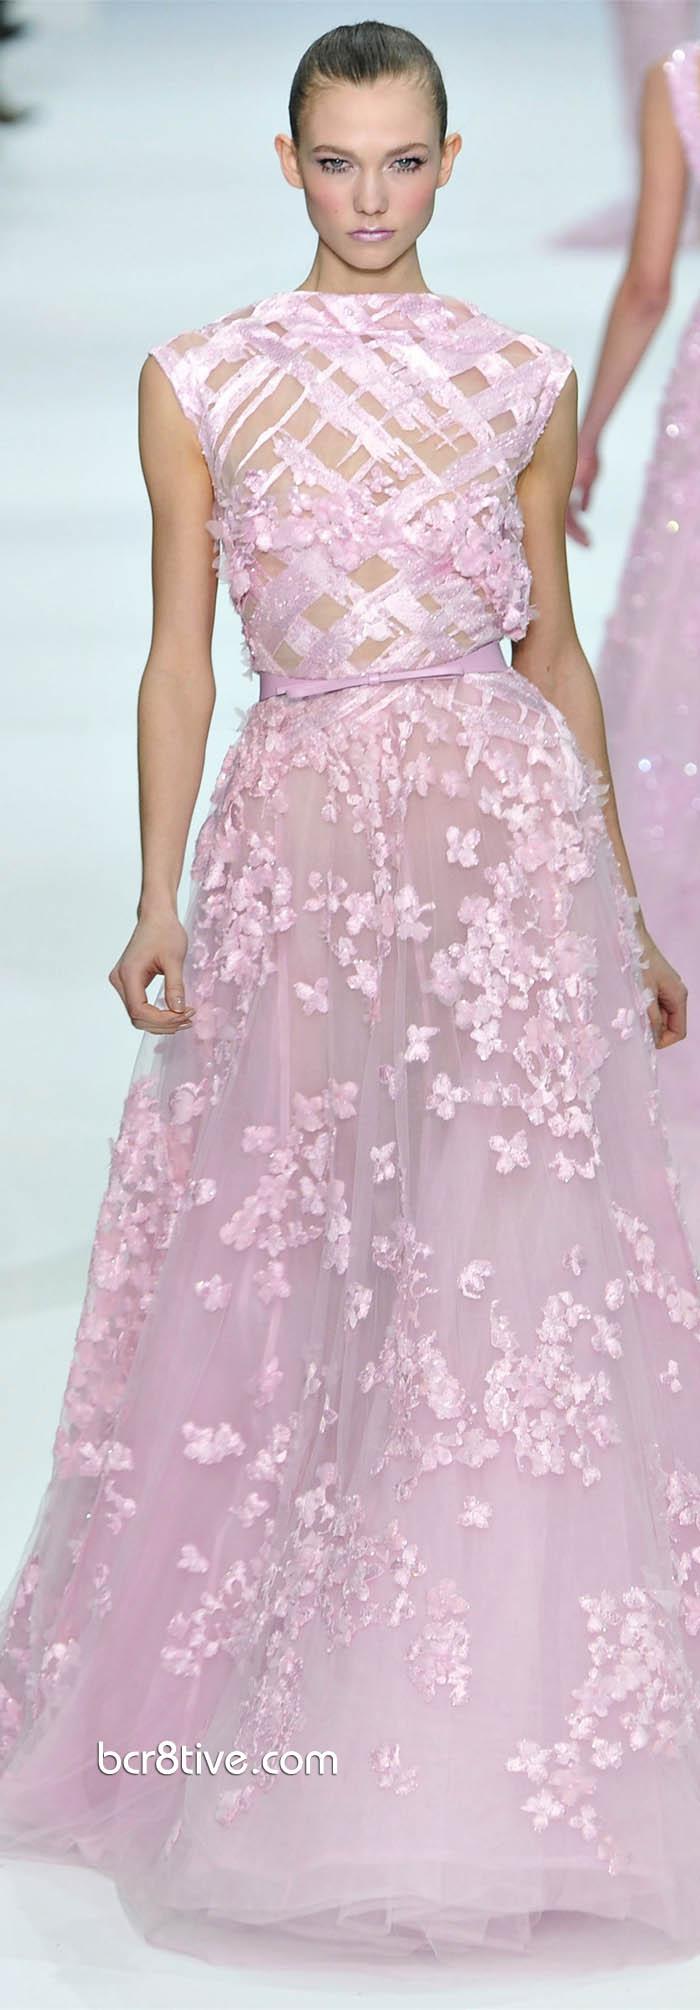 Elie Saab Spring Summer 2012-2013 Haute Couture